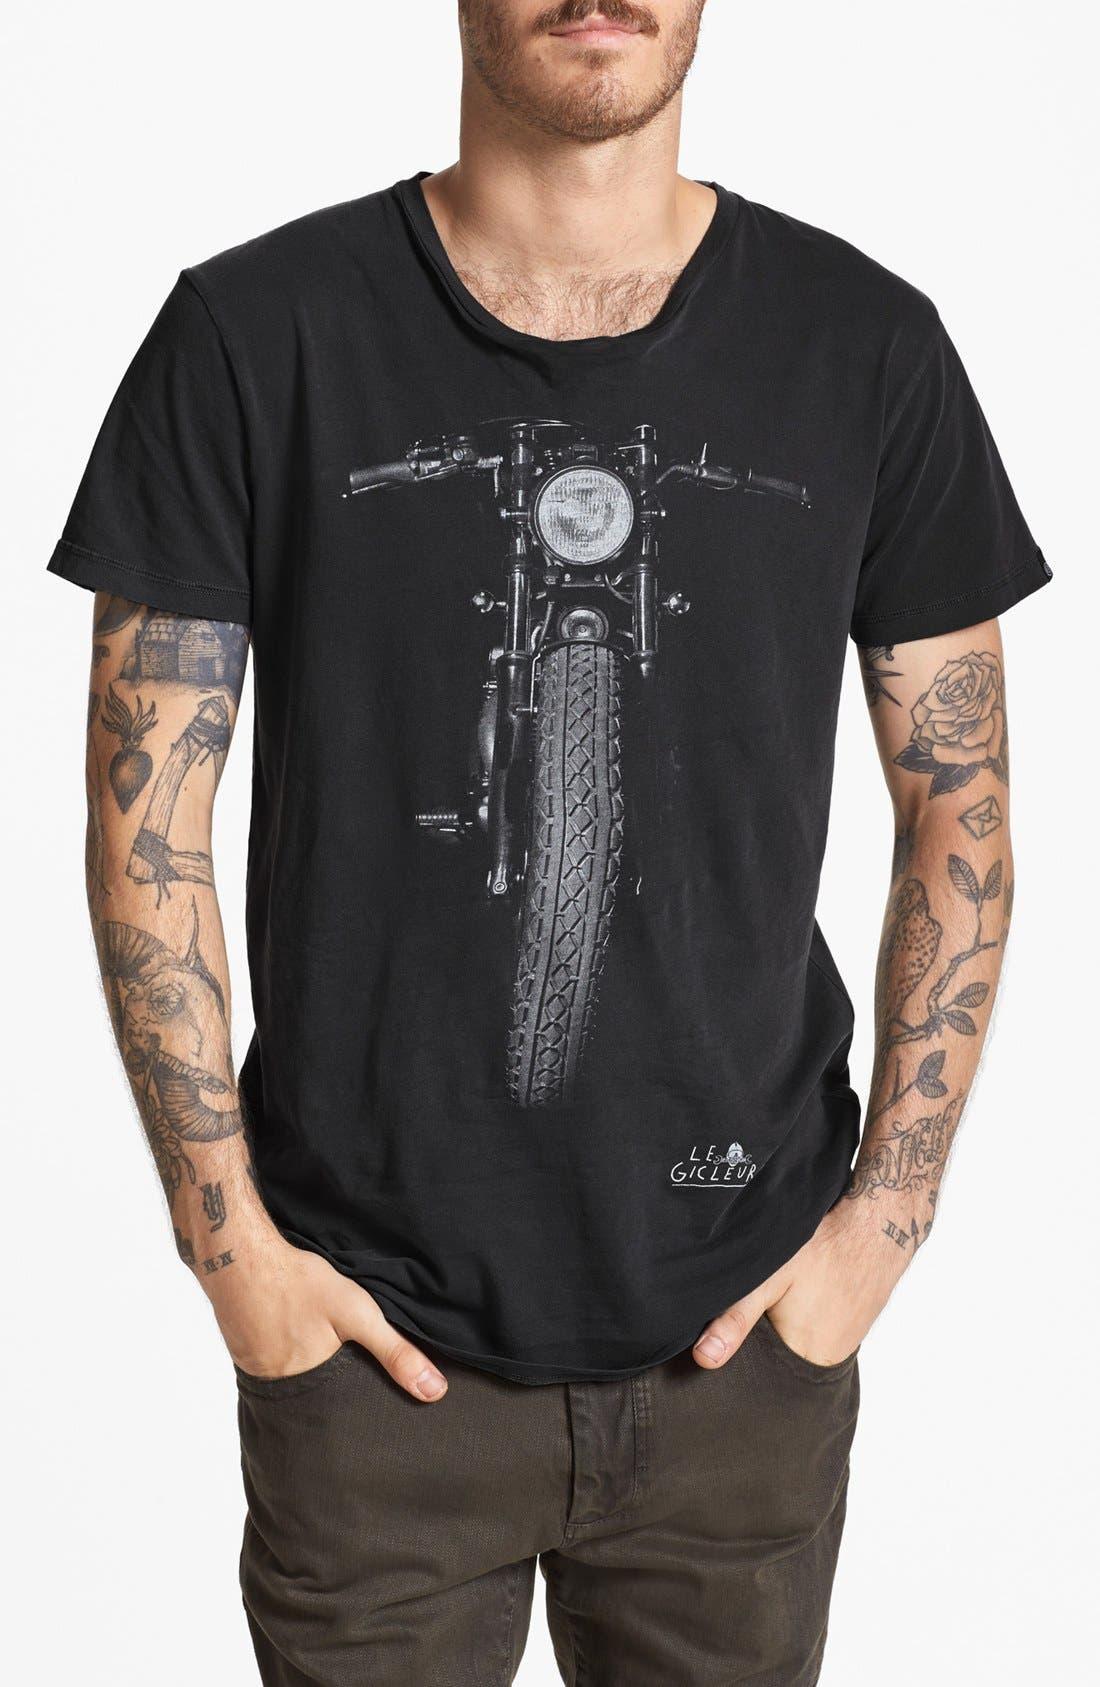 Alternate Image 1 Selected - Deus Ex Machina 'Gicleur Noir' T-Shirt